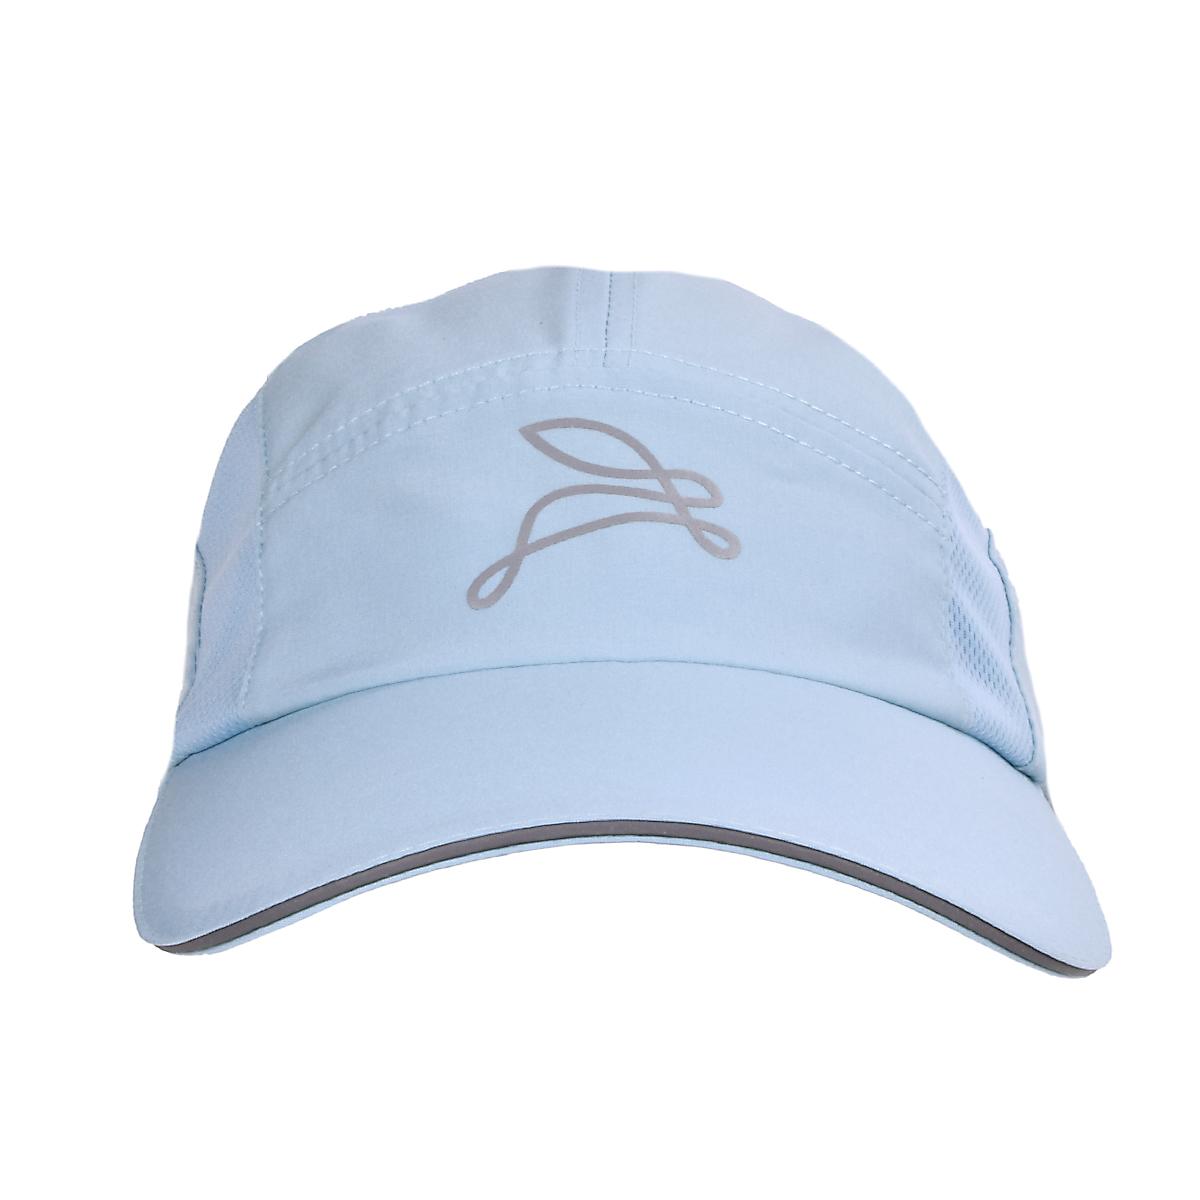 JackRabbit Run Hat - Color: Light Blue - Size: One Size, Light Blue, large, image 3